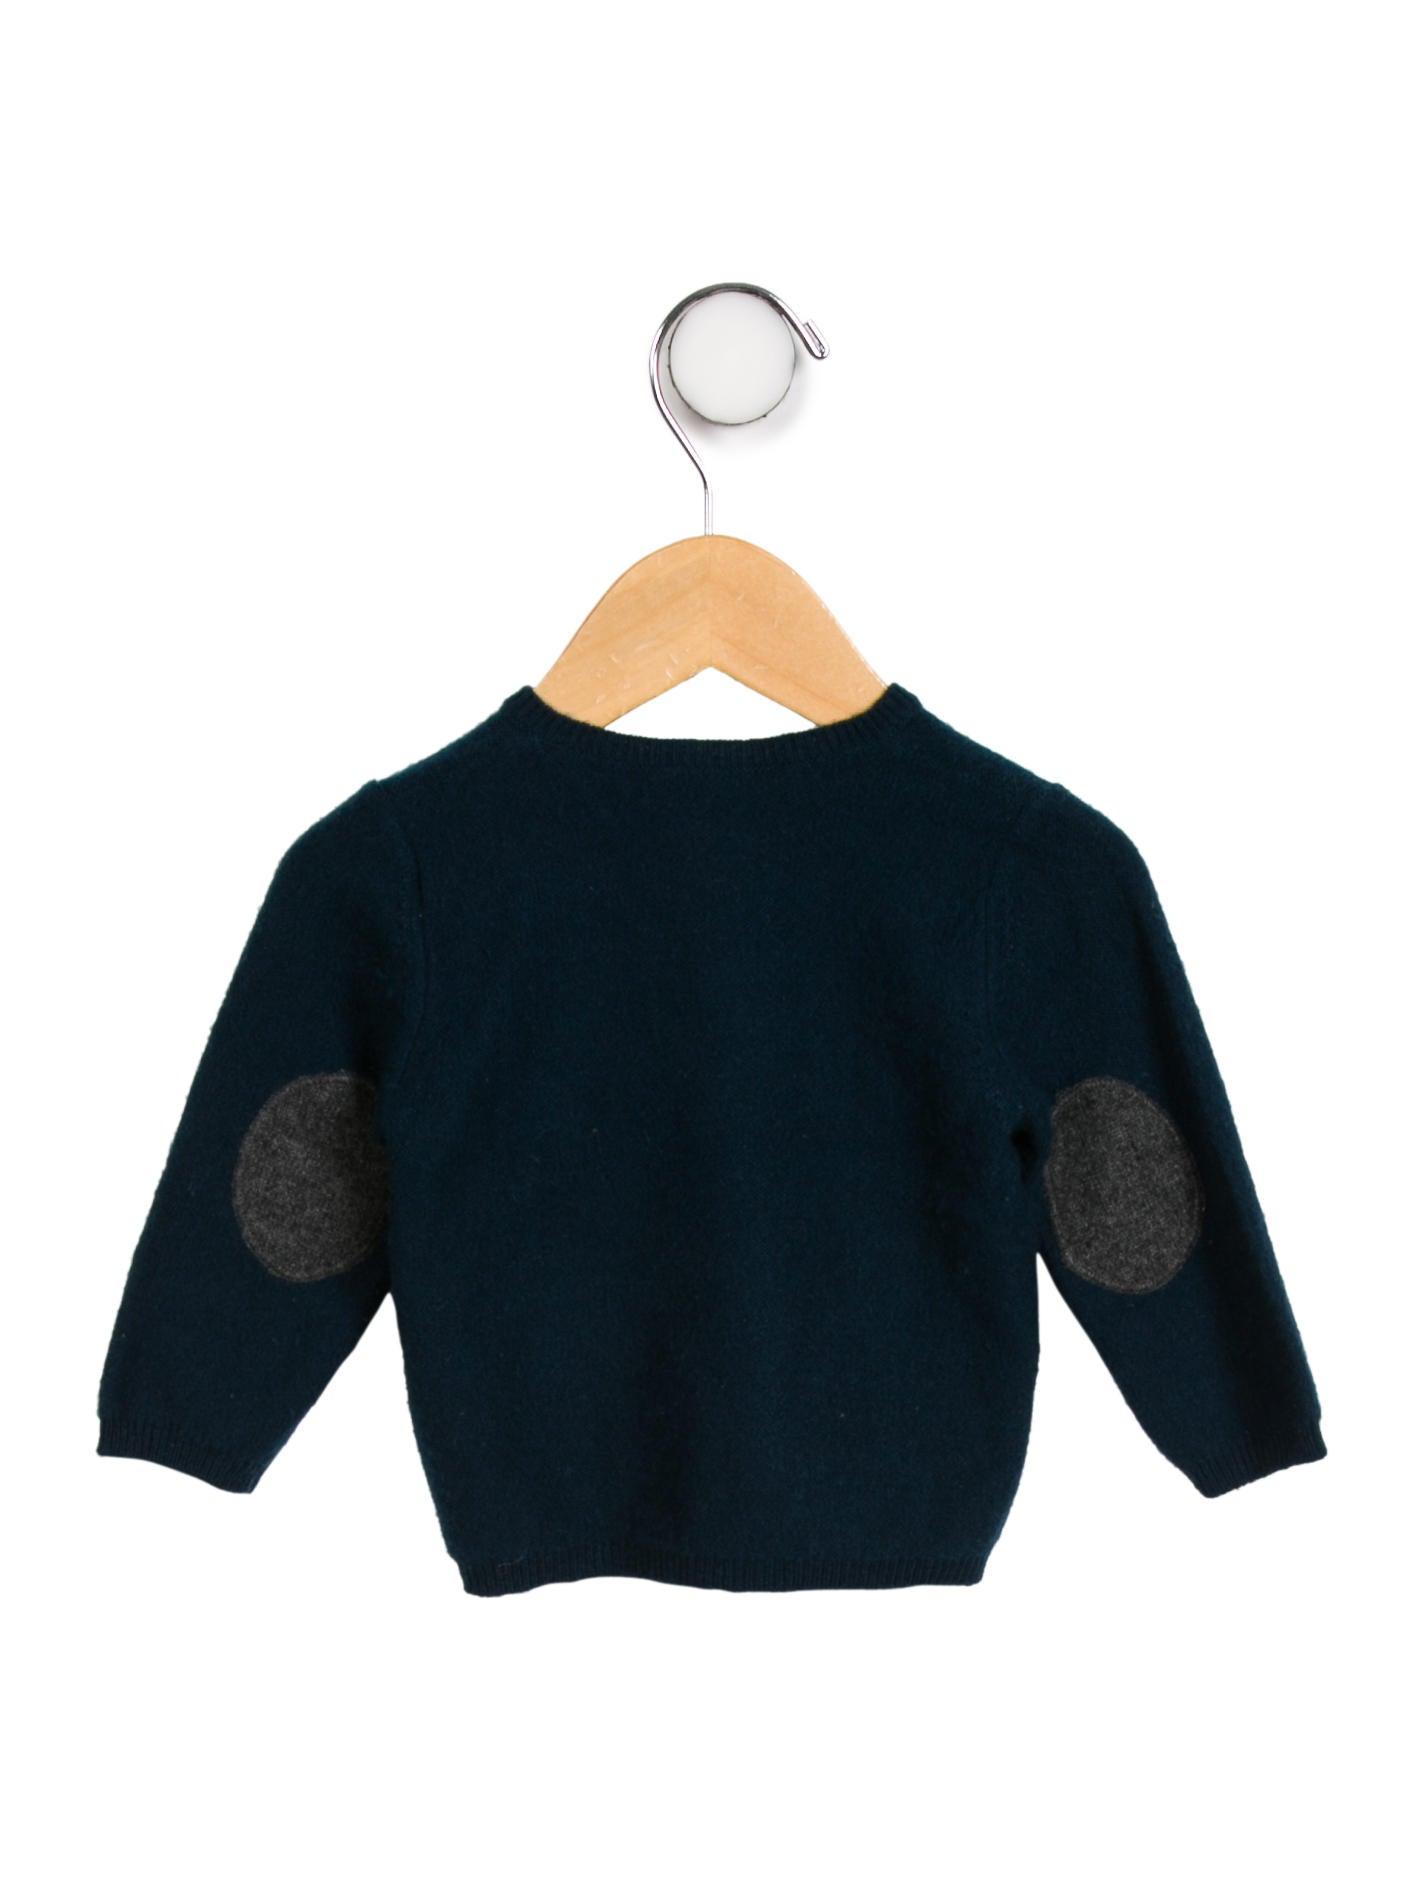 1f585778fdc5 Bonpoint Boys  Cashmere Sweater - Boys - WBONP33148